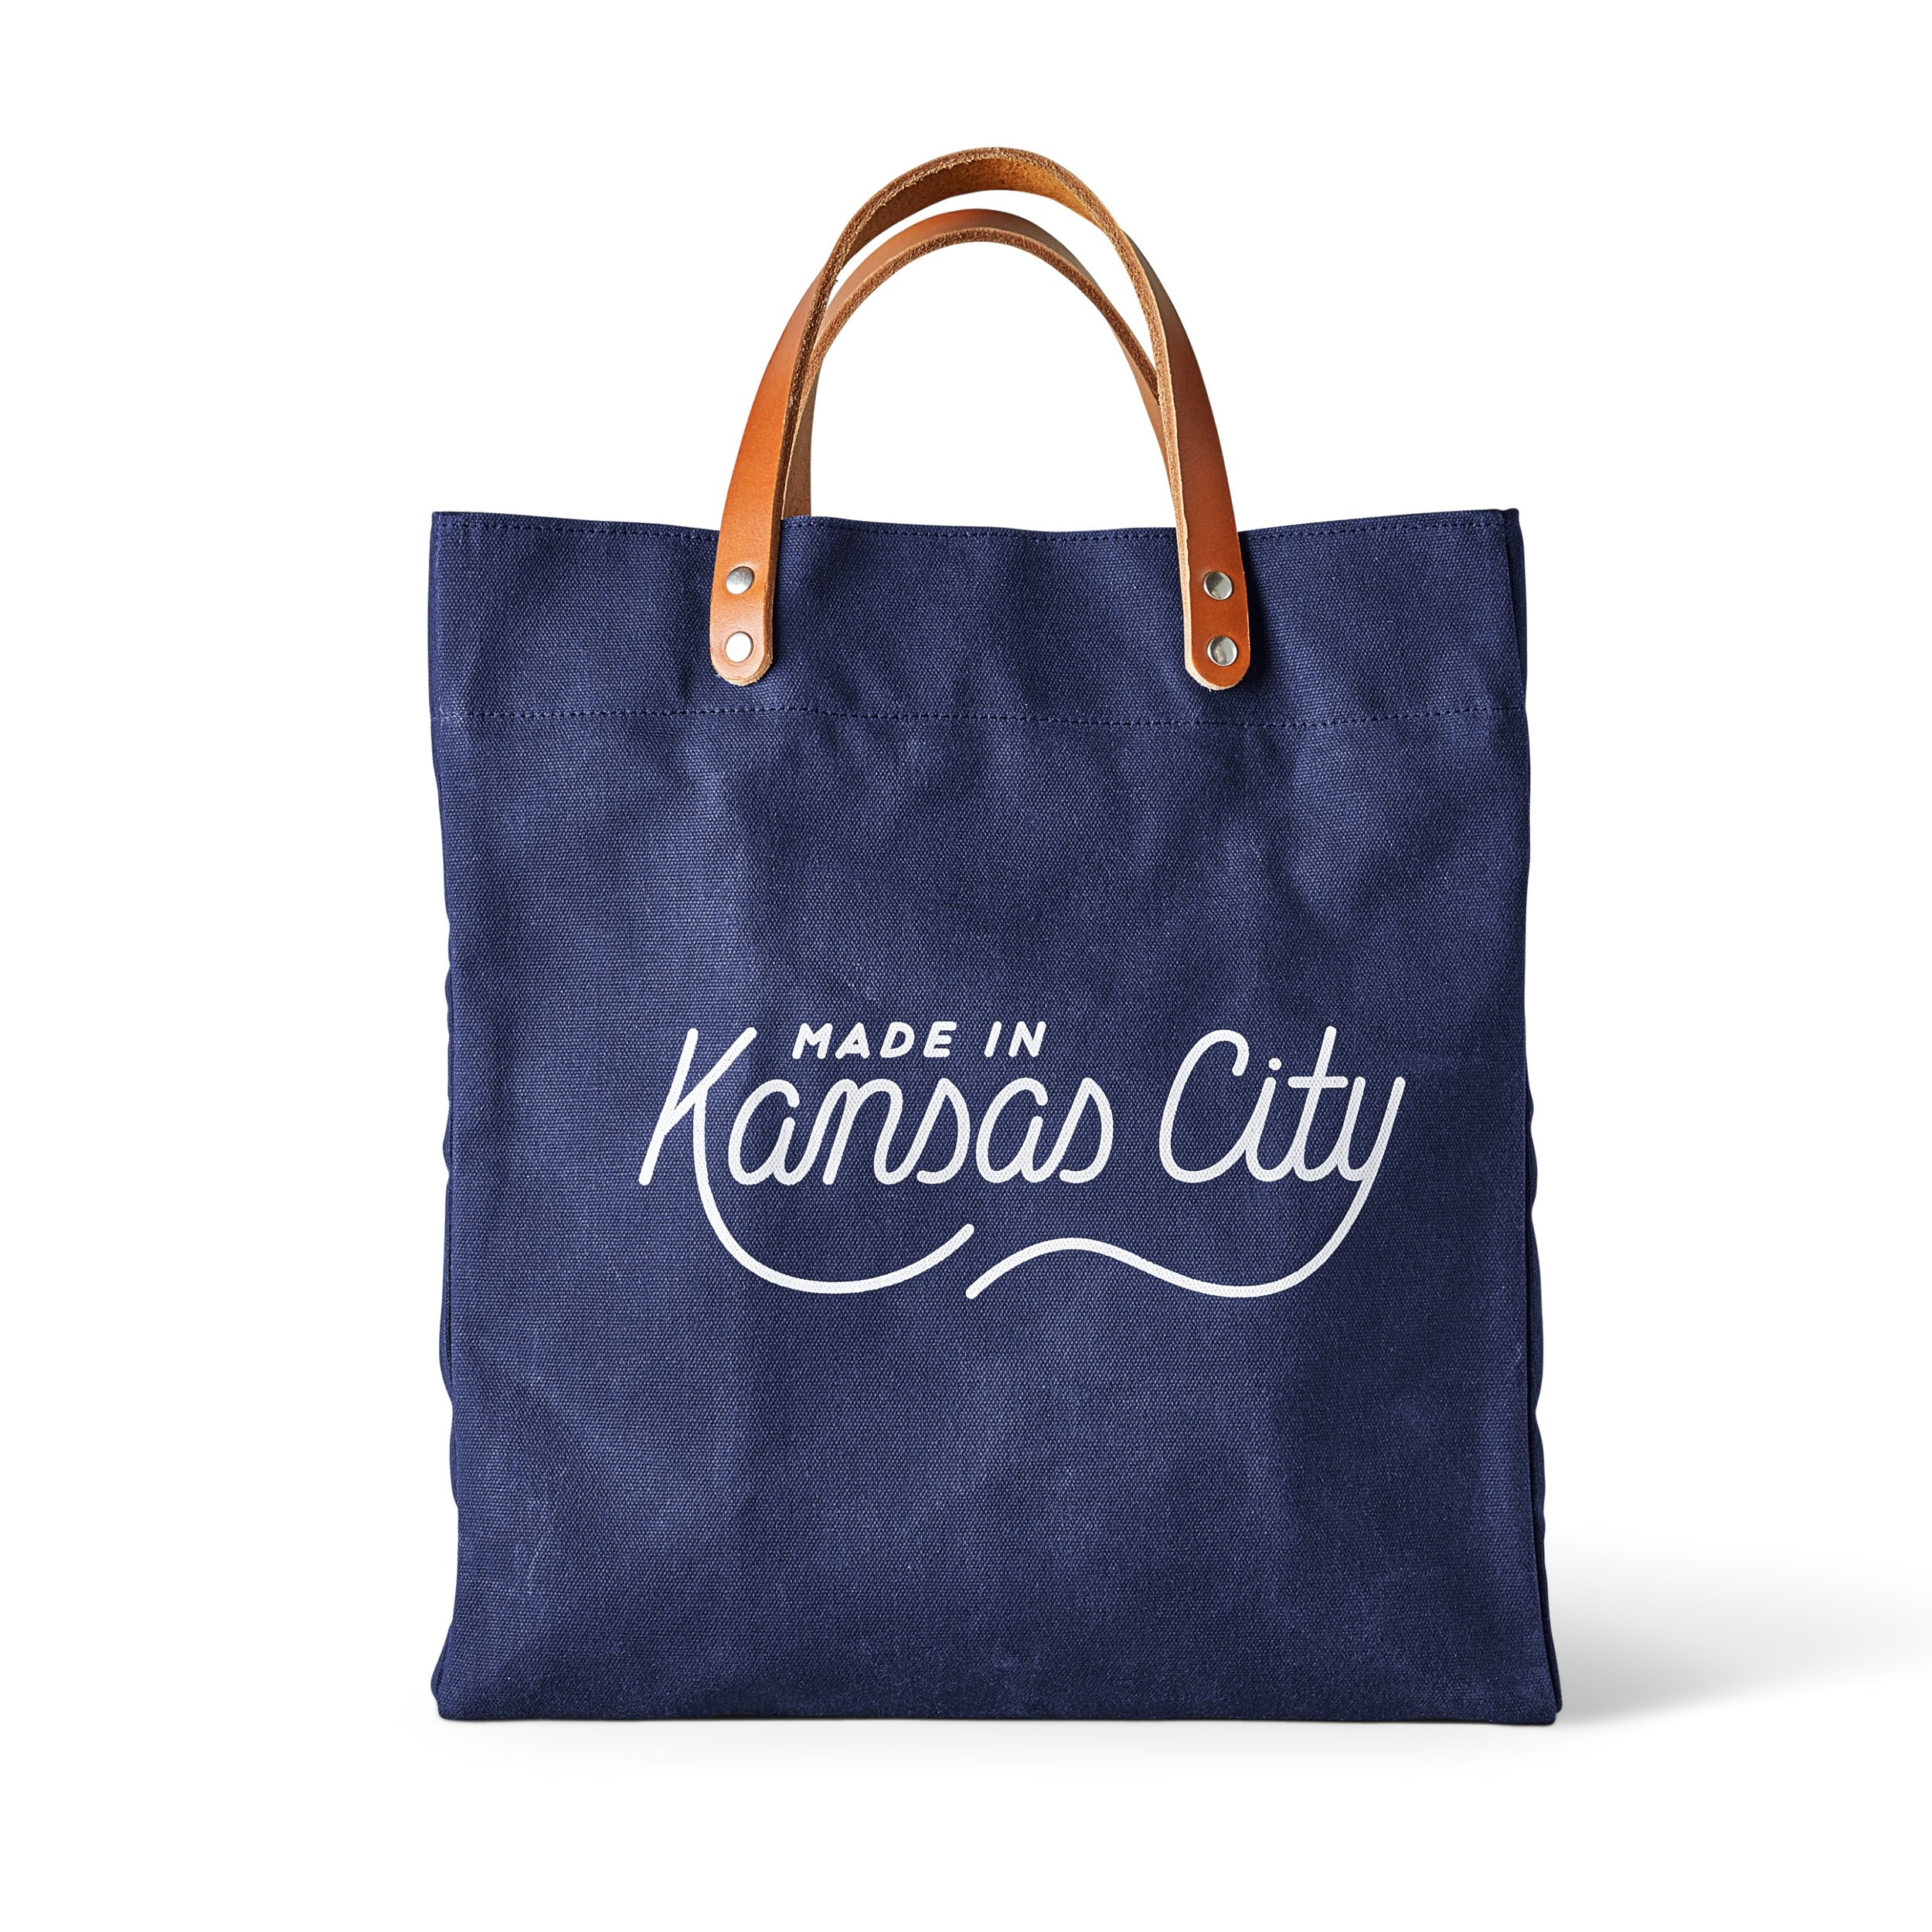 Made in Kansas City x Sandlot Goods Tote